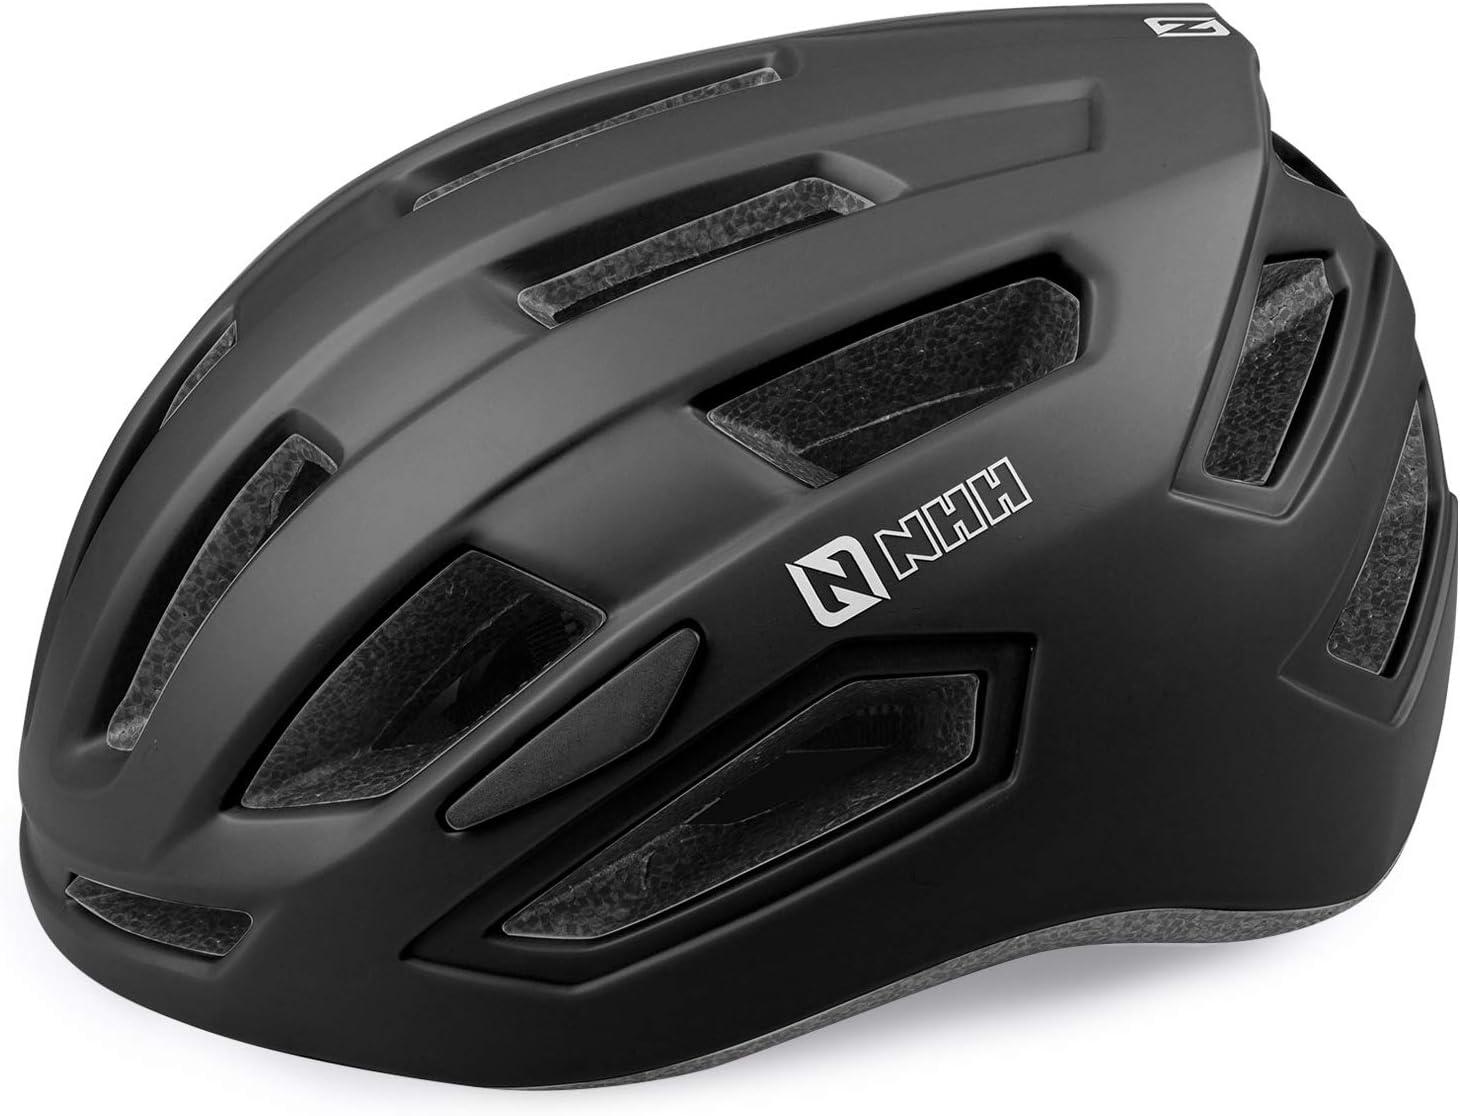 NHH Adult Bike Houston Mall Helmet - Cycling Bicycle Great interest CPSC-Compliant Li